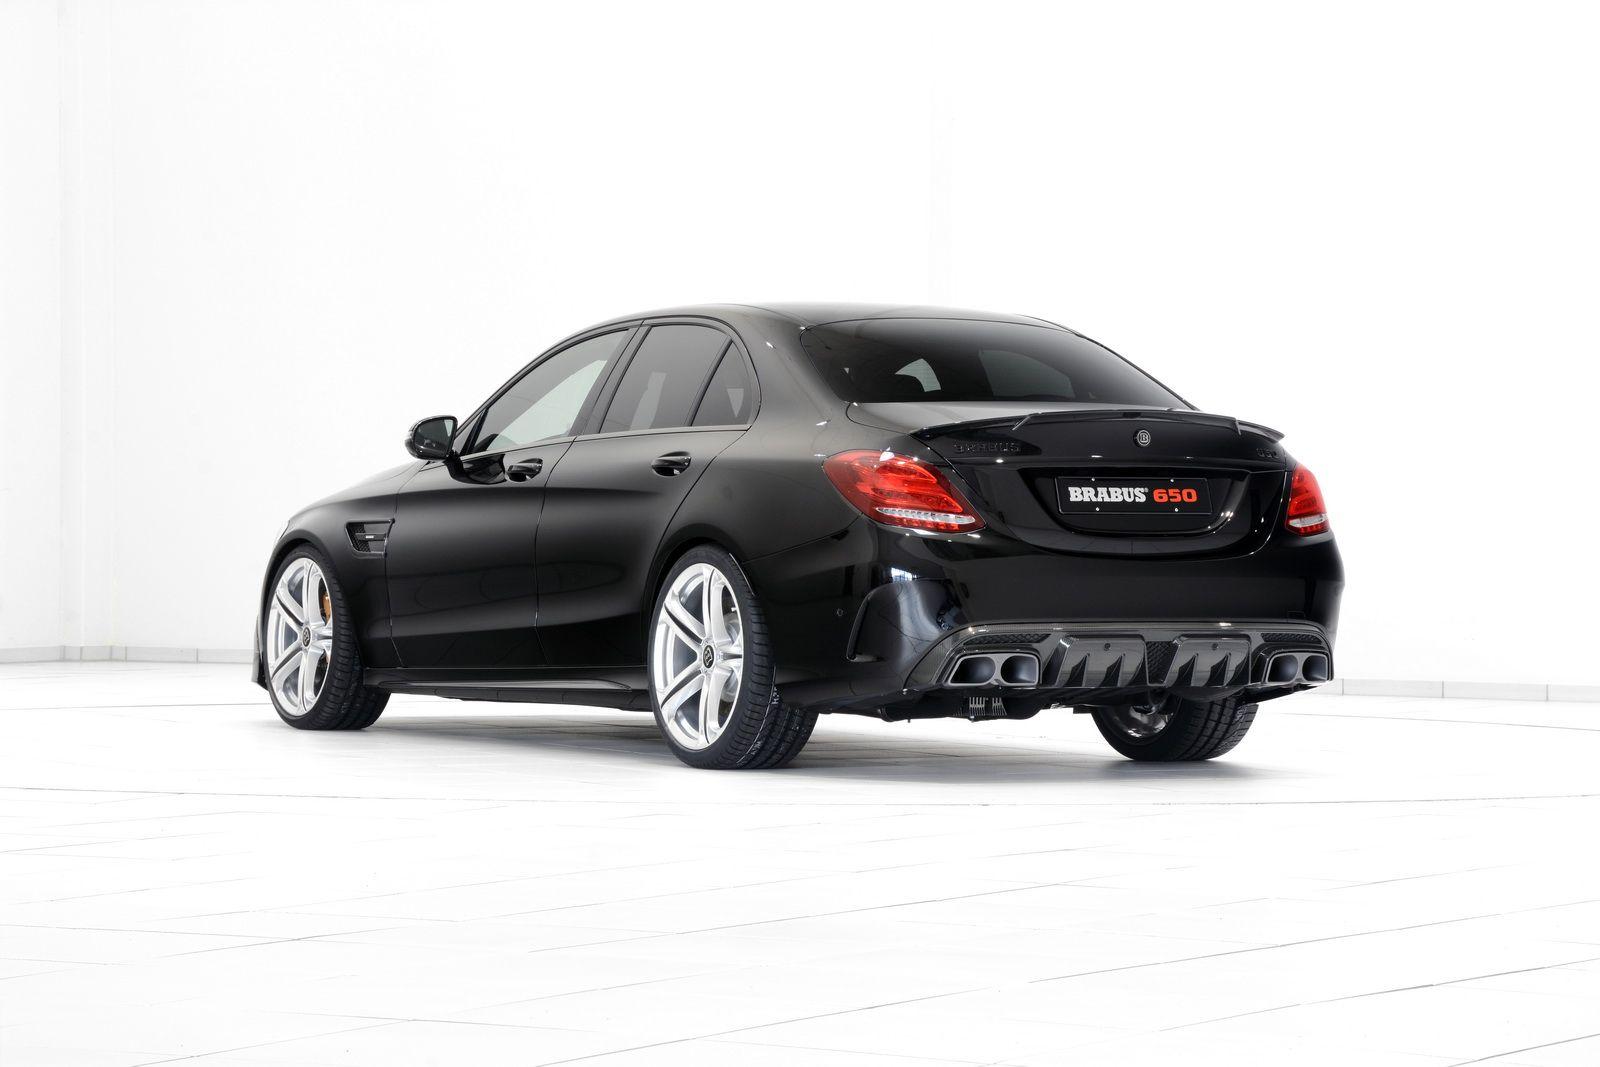 Brabus Vindt Mercedes C63 S Amg Te Min Geeft Anabolen A B M W